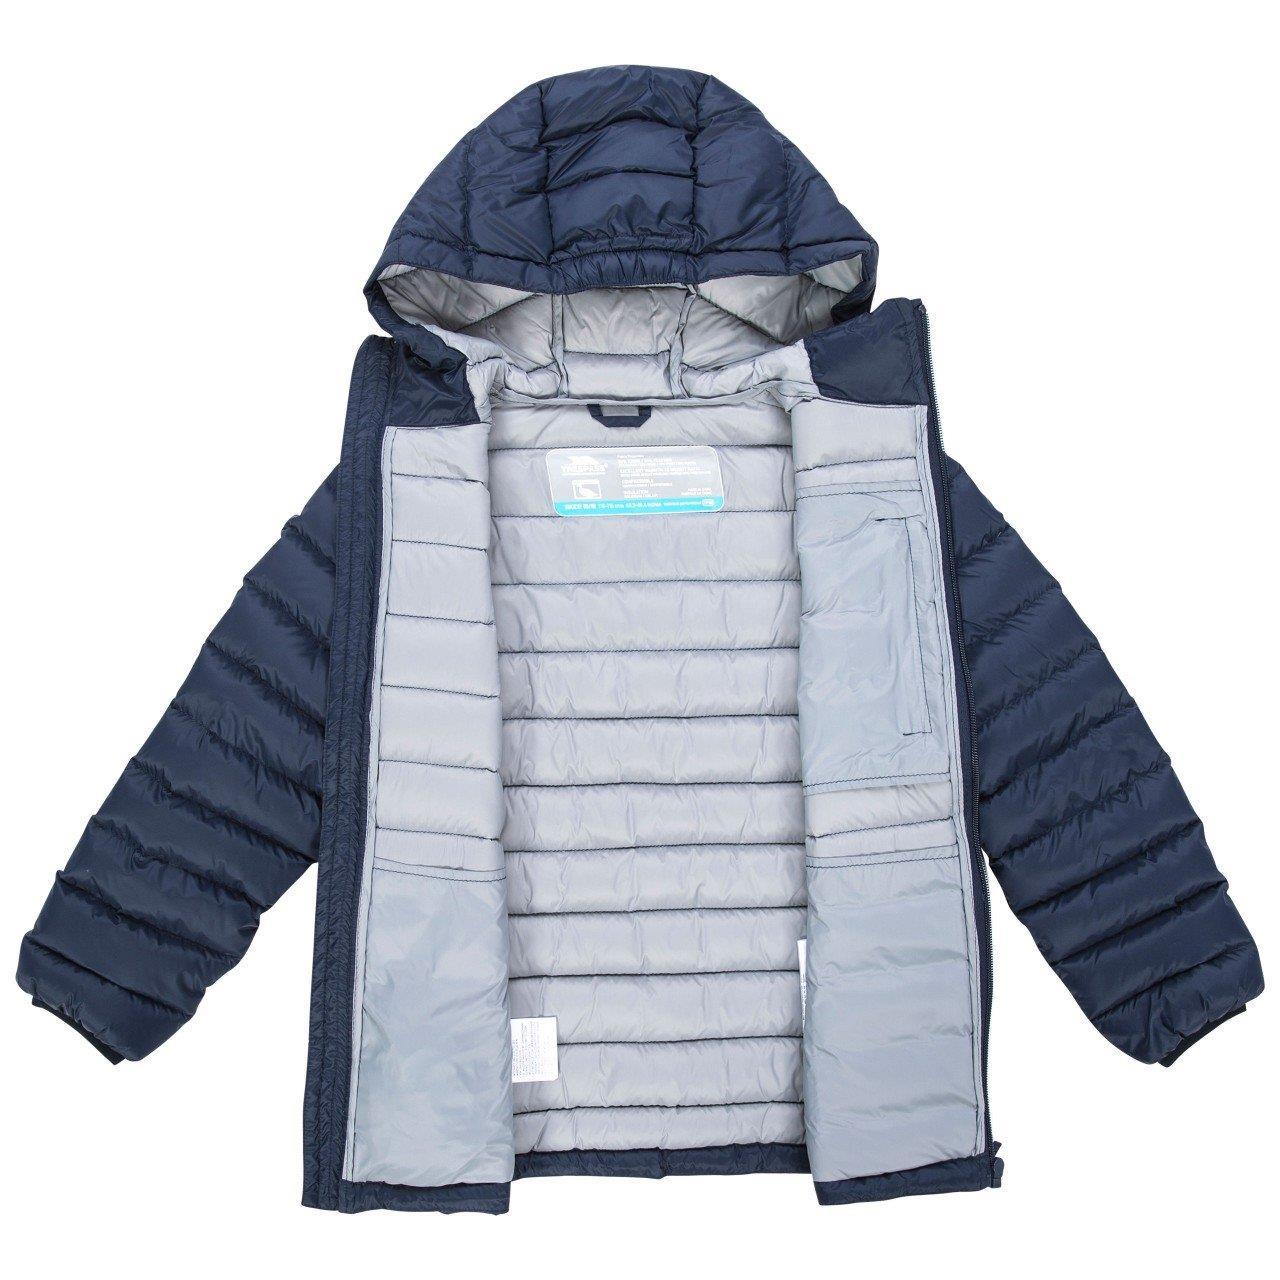 7b096bc71 Trespass Morley Kids Down Filled Jacket - Run Charlie